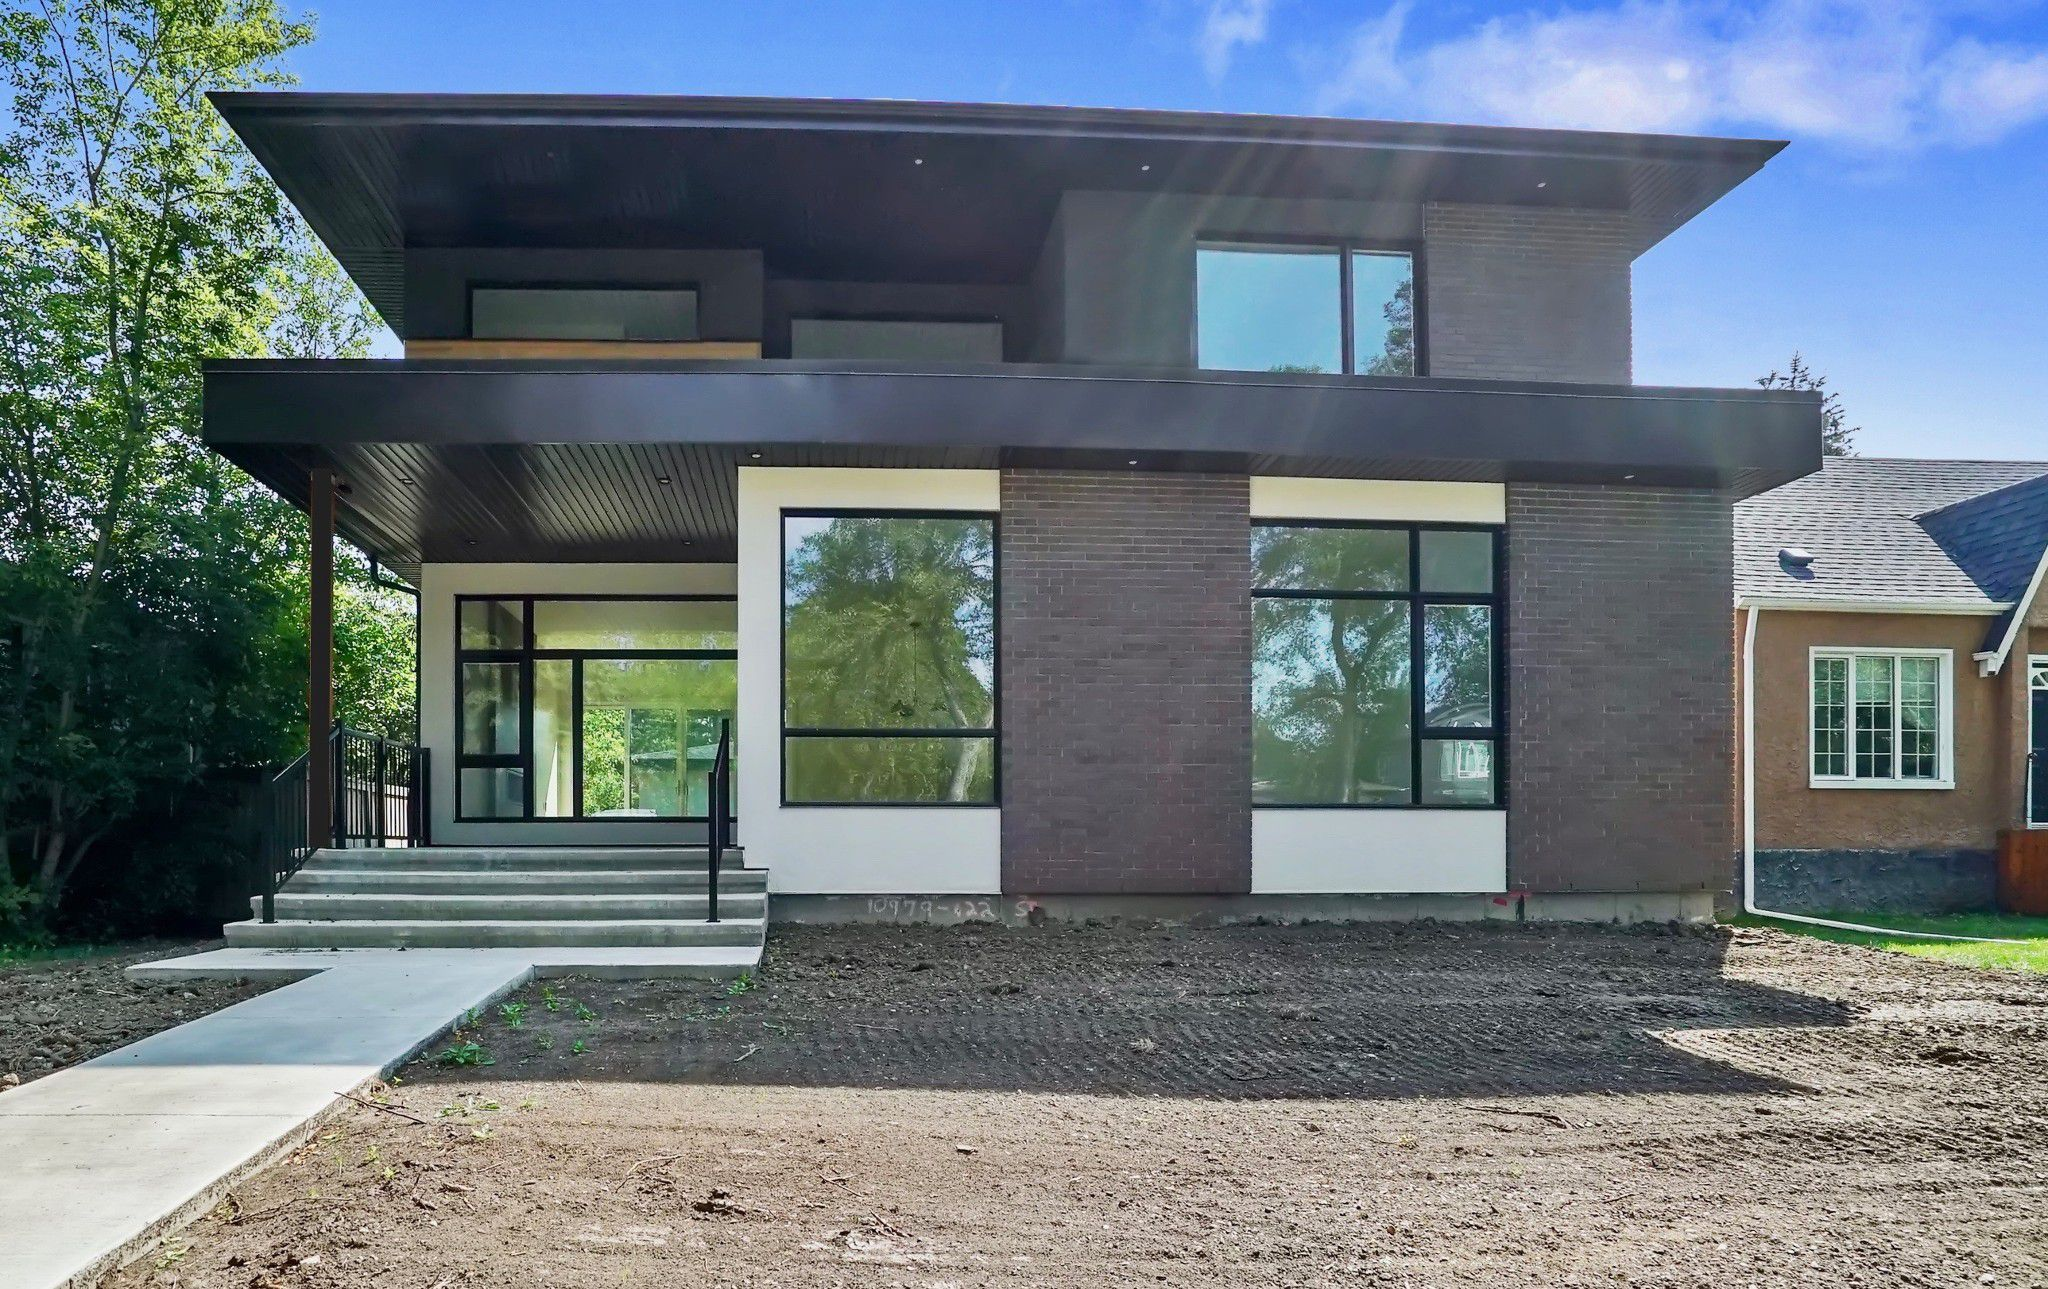 Main Photo: 10979 122 Street NW in Edmonton: Westmount House for sale : MLS®# E4123909